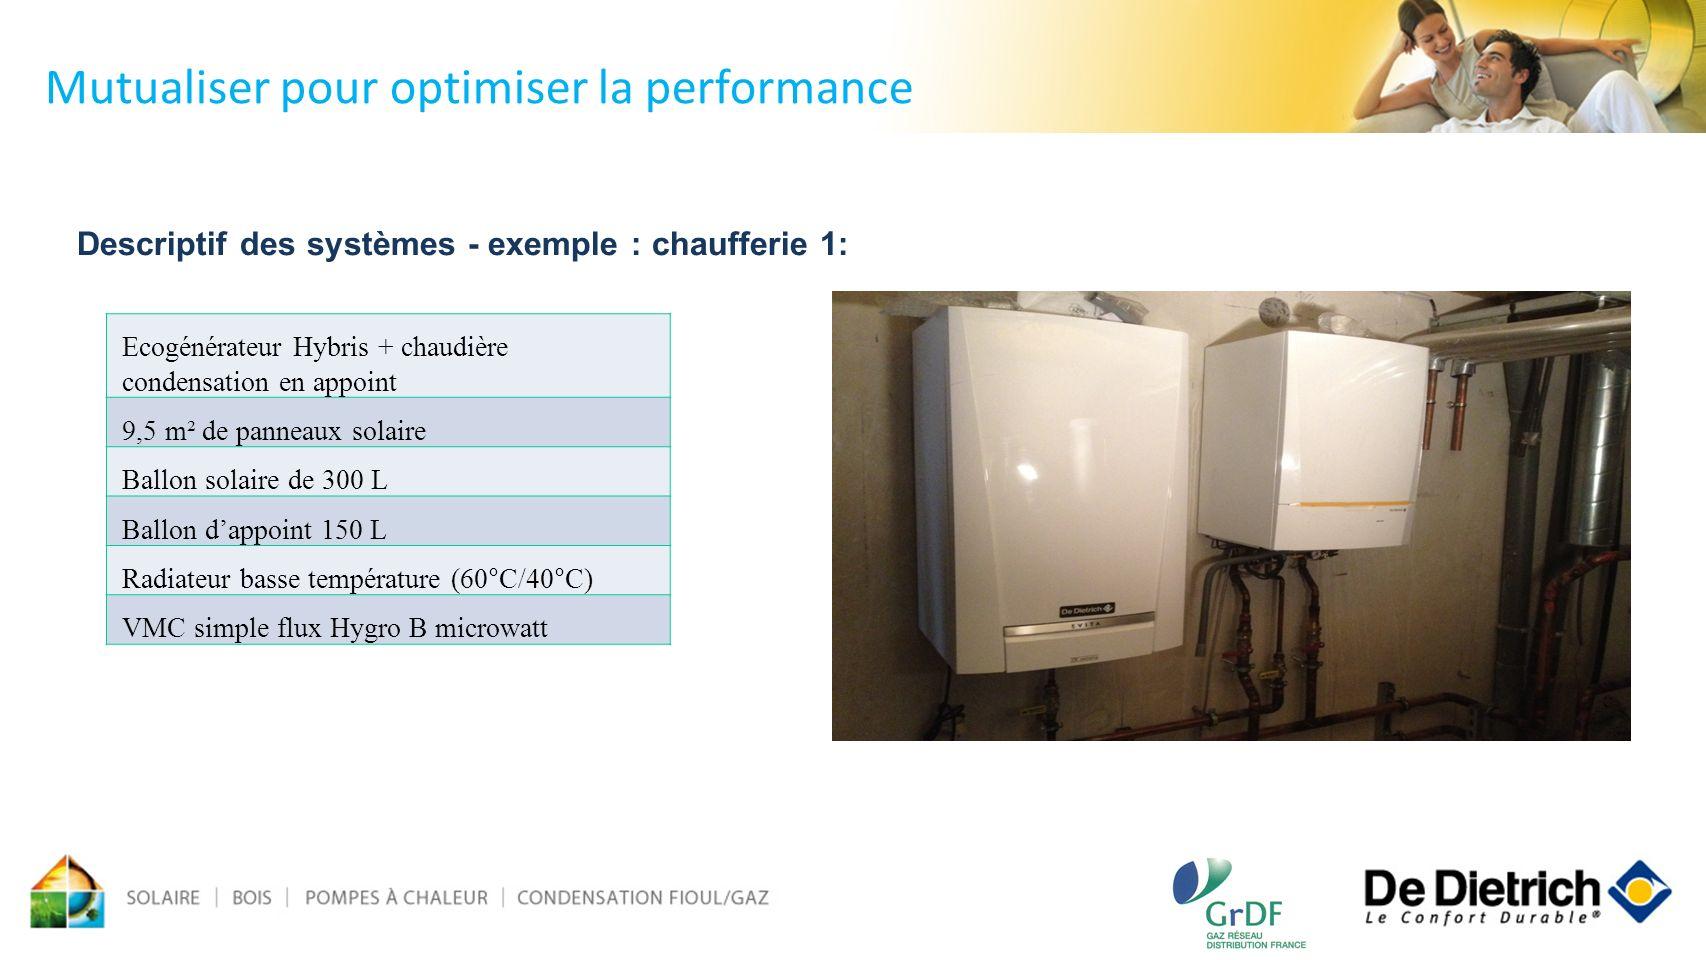 Mutualiser pour optimiser la performance